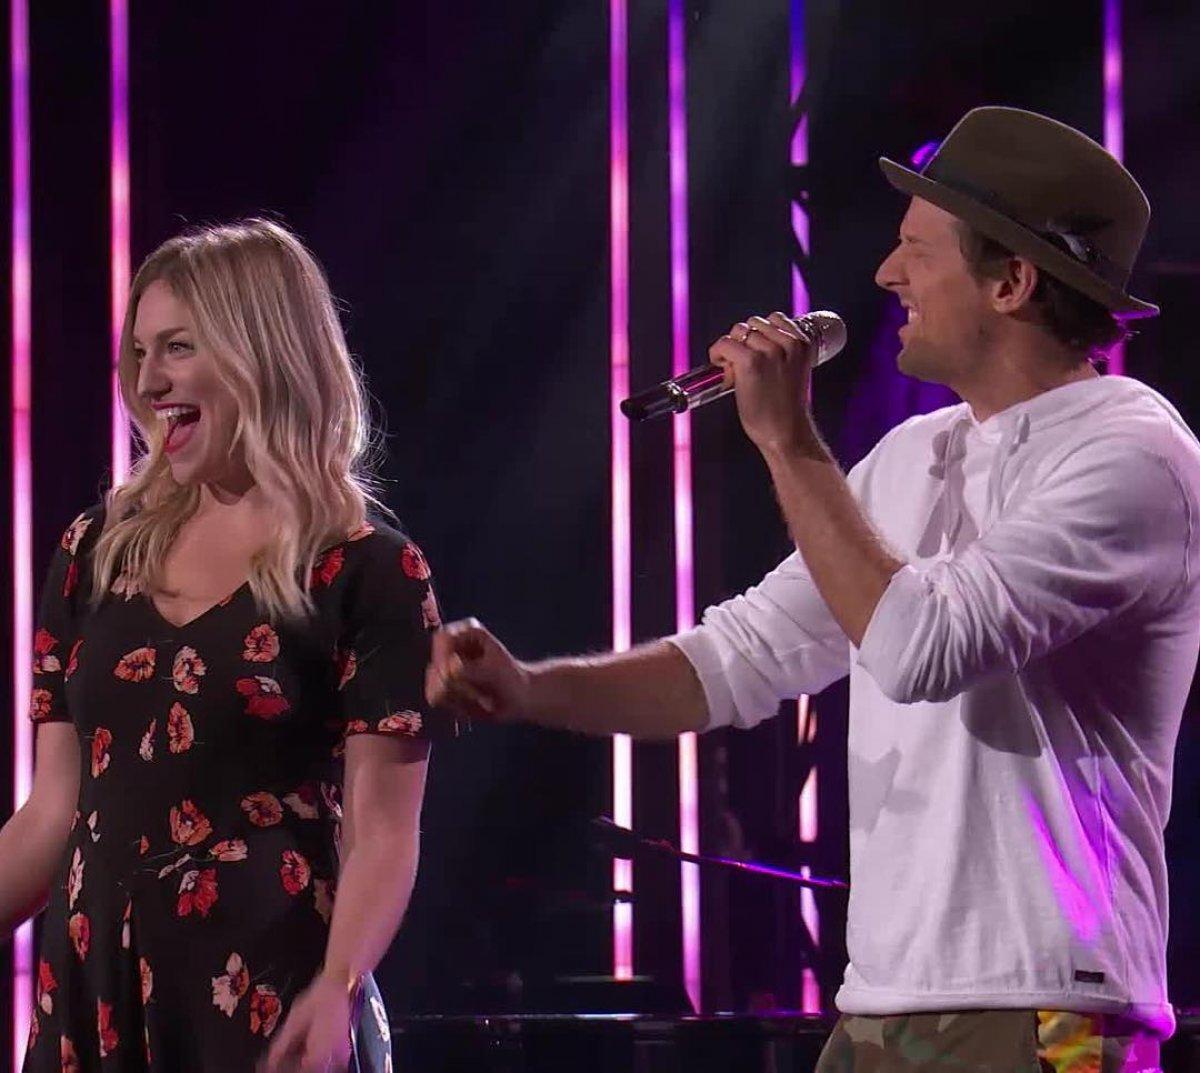 Big Brother Global: 'American Idol' recap: Judges cut Shawn